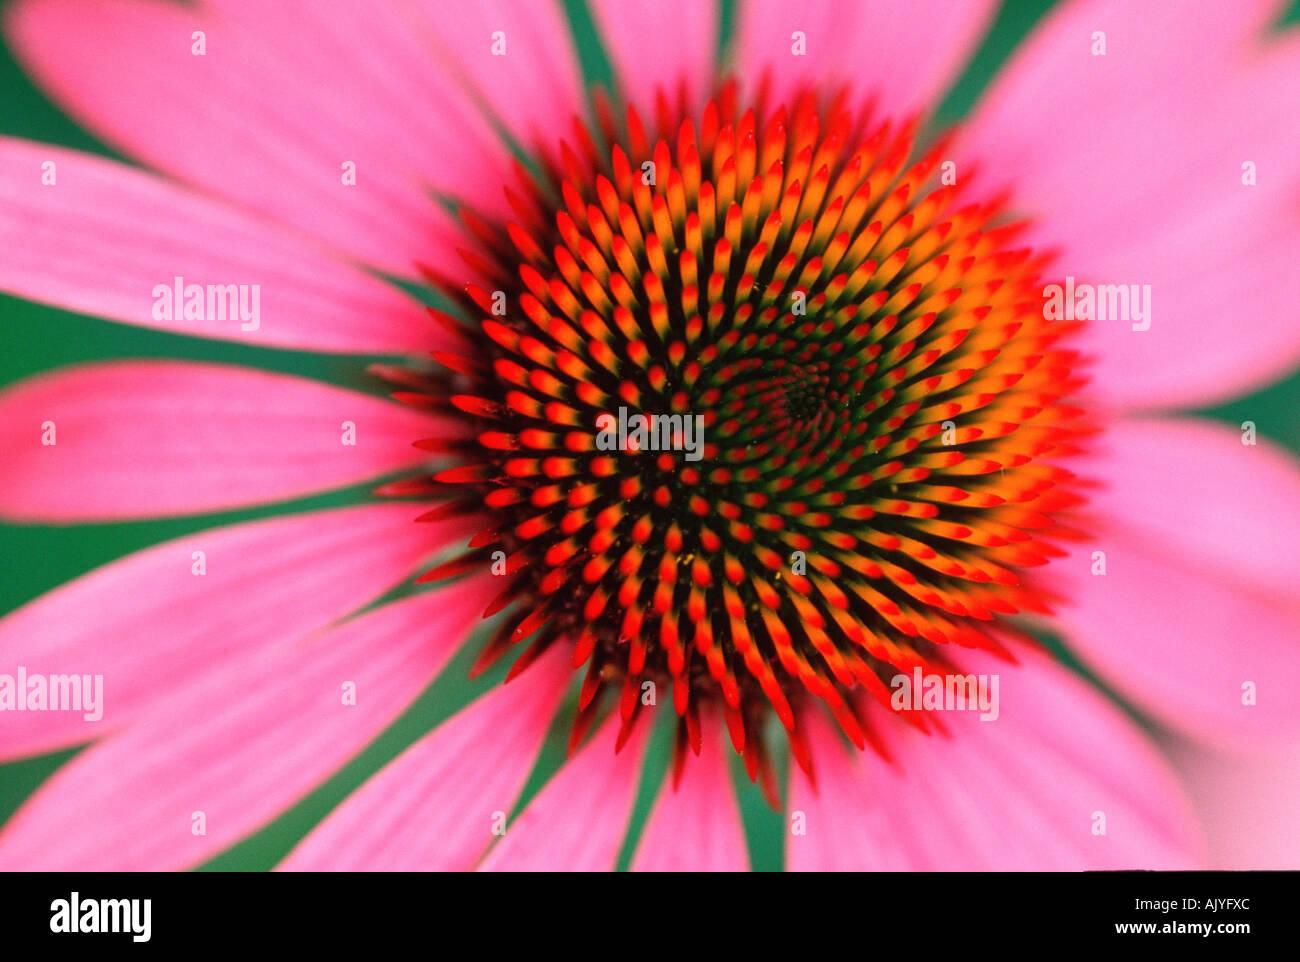 Purple Coneflower / Roter Sonnenhut / Purpur-Sonnenhut - Stock Image